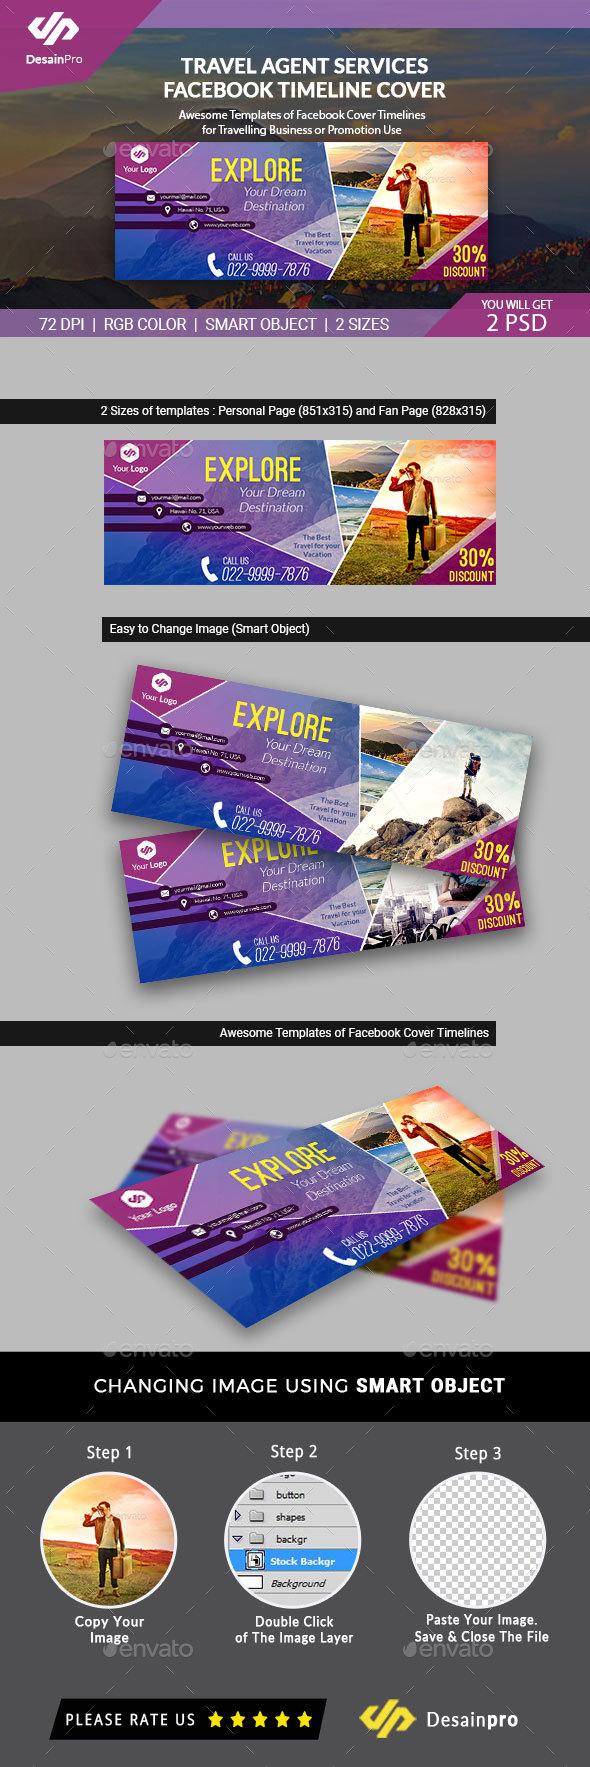 Travel Agent FB Cover Timeline Template - AR - Facebook Timeline Covers Social Media